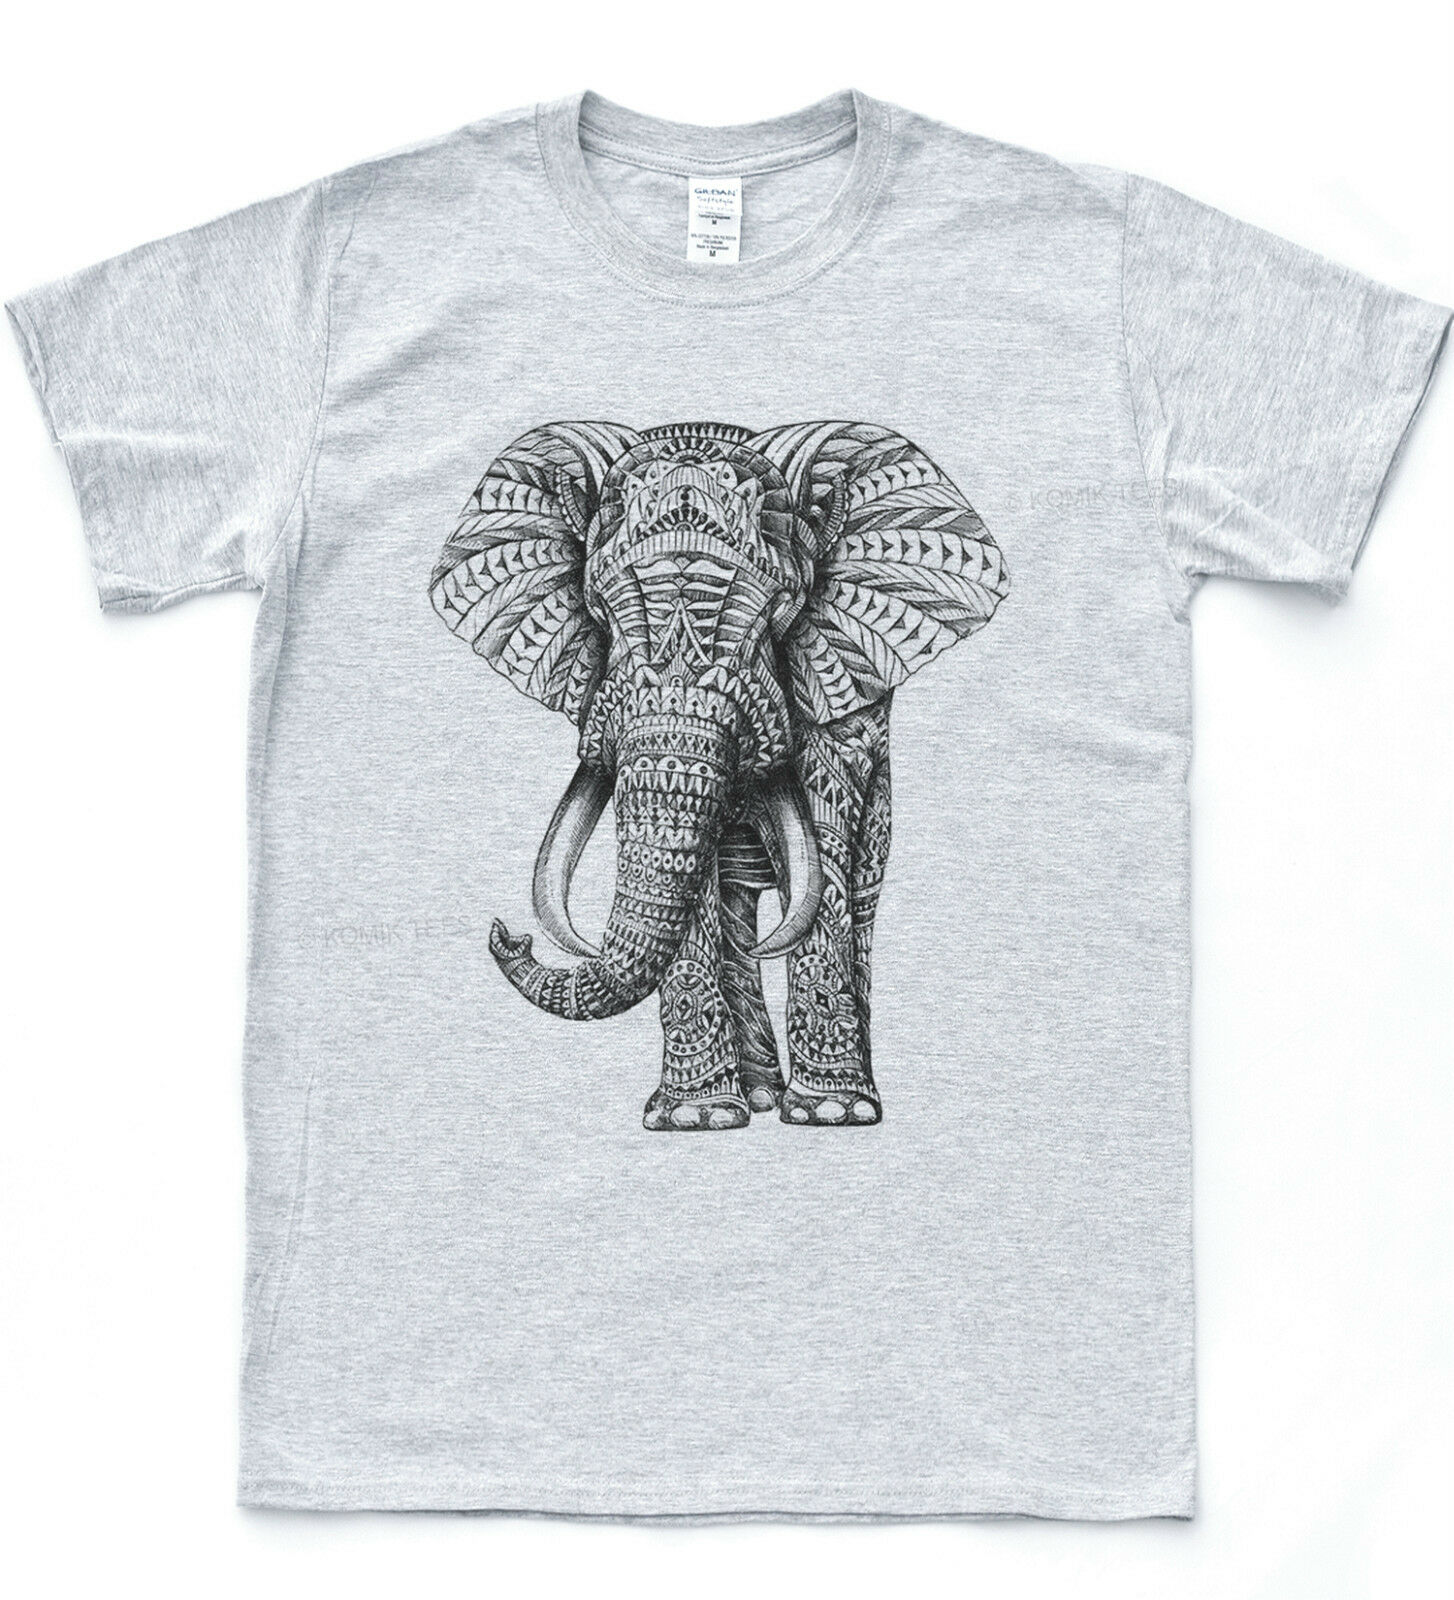 Elefante Navajo estilo estampado camiseta azteca Hipster África salvaje camiseta de naturaleza